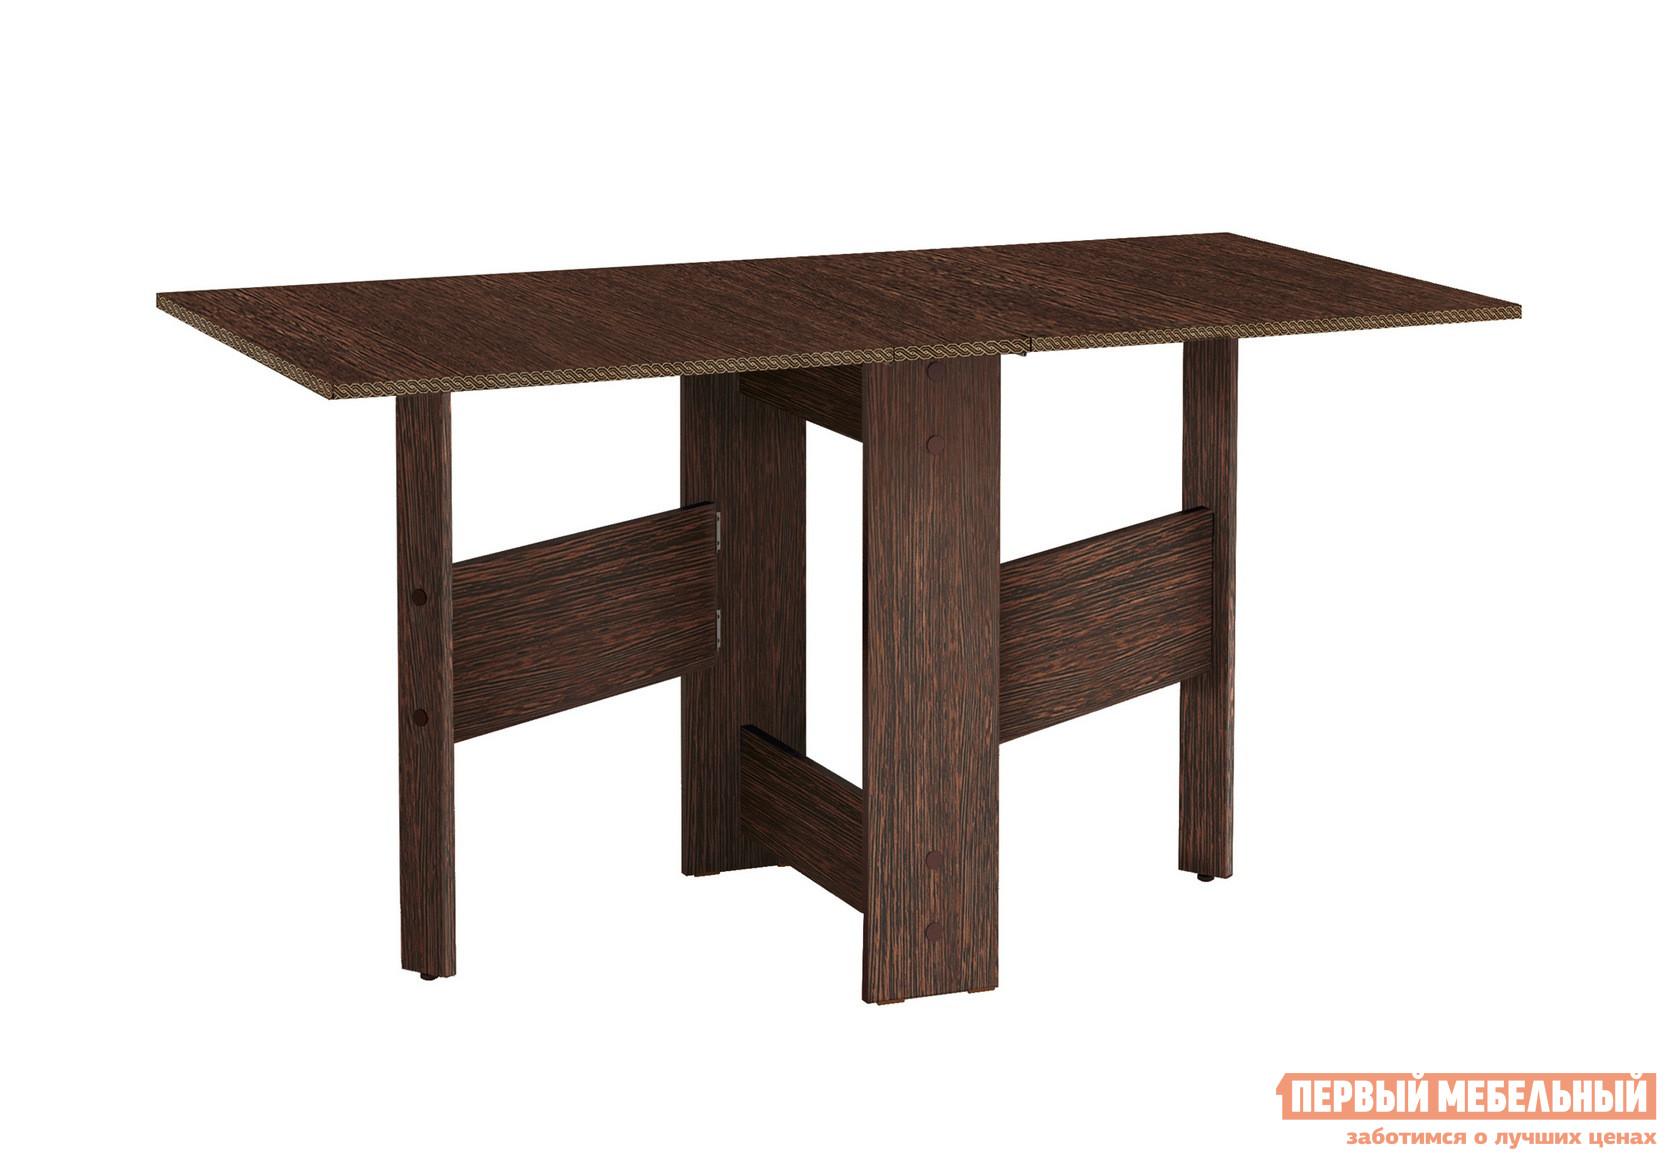 Узкий кухонный стол-книжка Витра Колибри-15 Лайт витра стол книжка витра колибри 4 2 венге